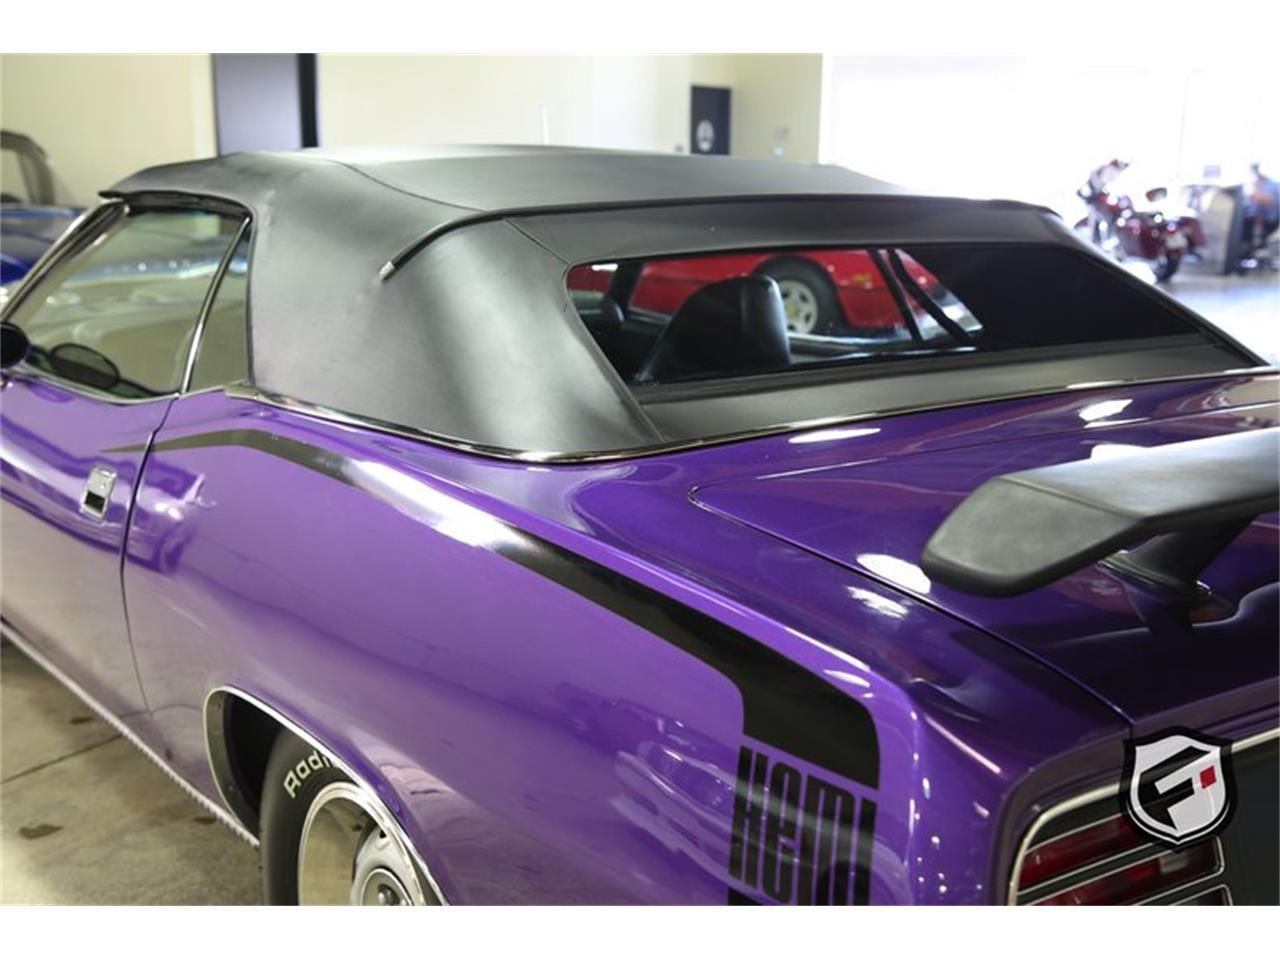 Large Picture of '70 Hemi 'Cuda Convertible located in California - $99,900.00 - LFH0